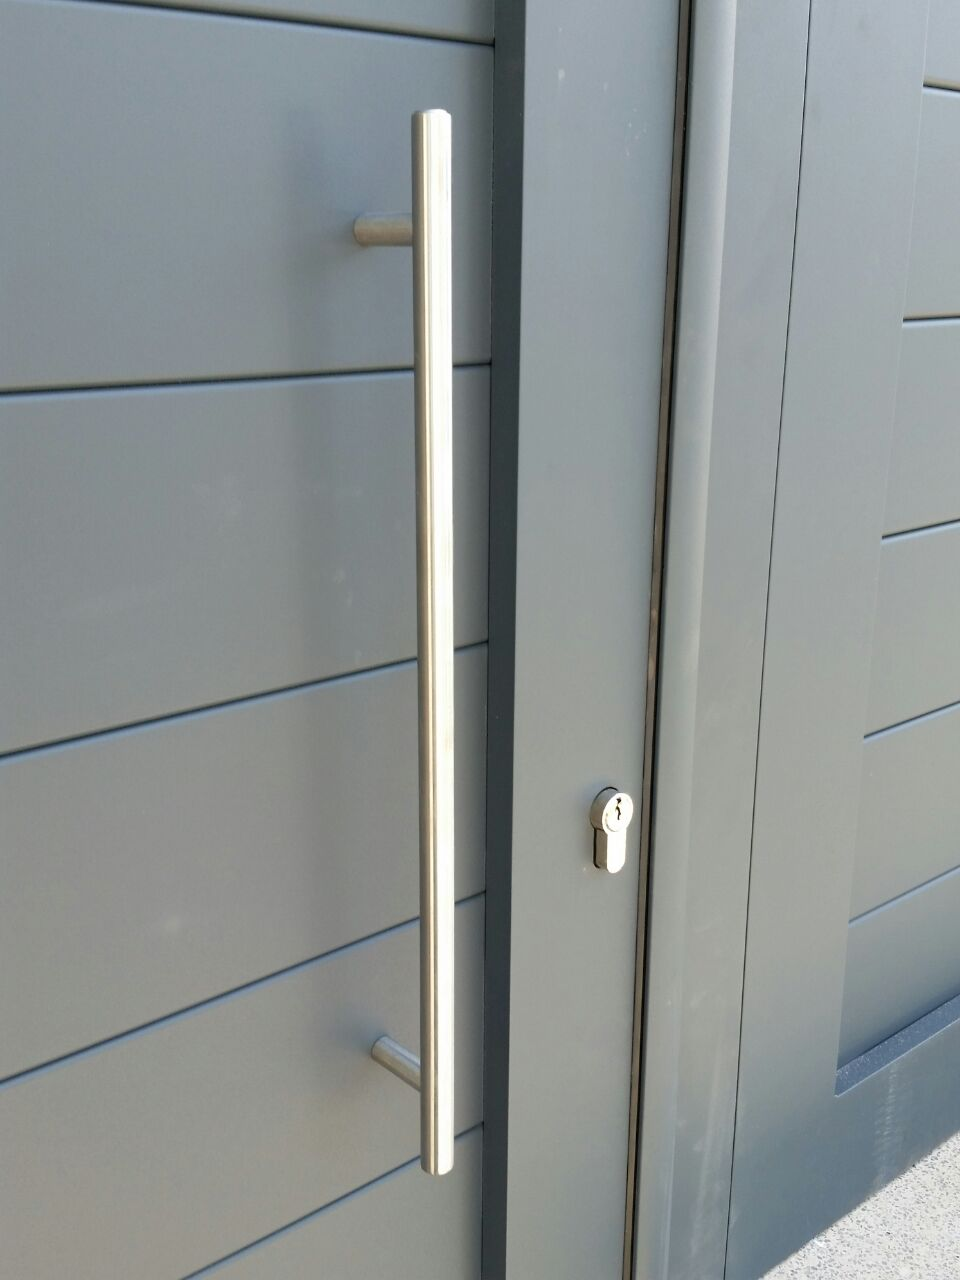 Puertas jardin aluminio puerta para jardn de aluminio - Puertas de hierro para jardin ...